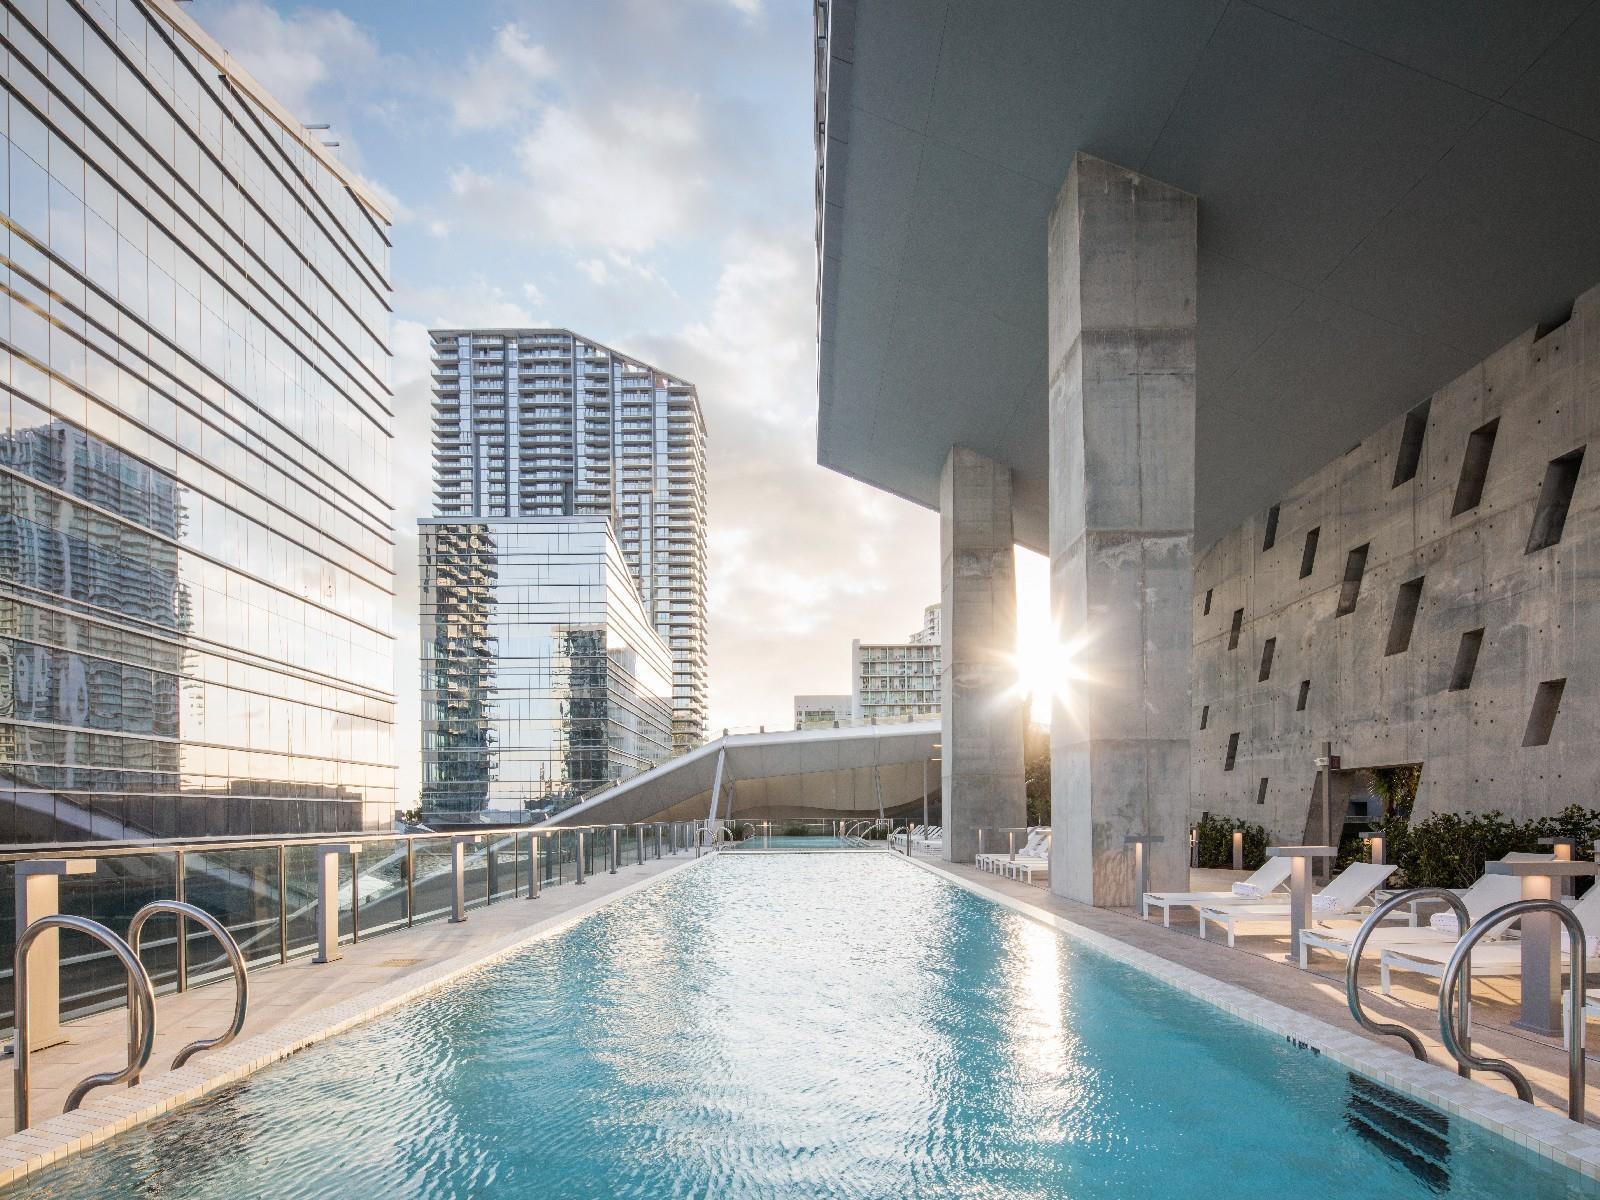 Brickell City Centre's Reach   Photo via One Sotheby's International Realty